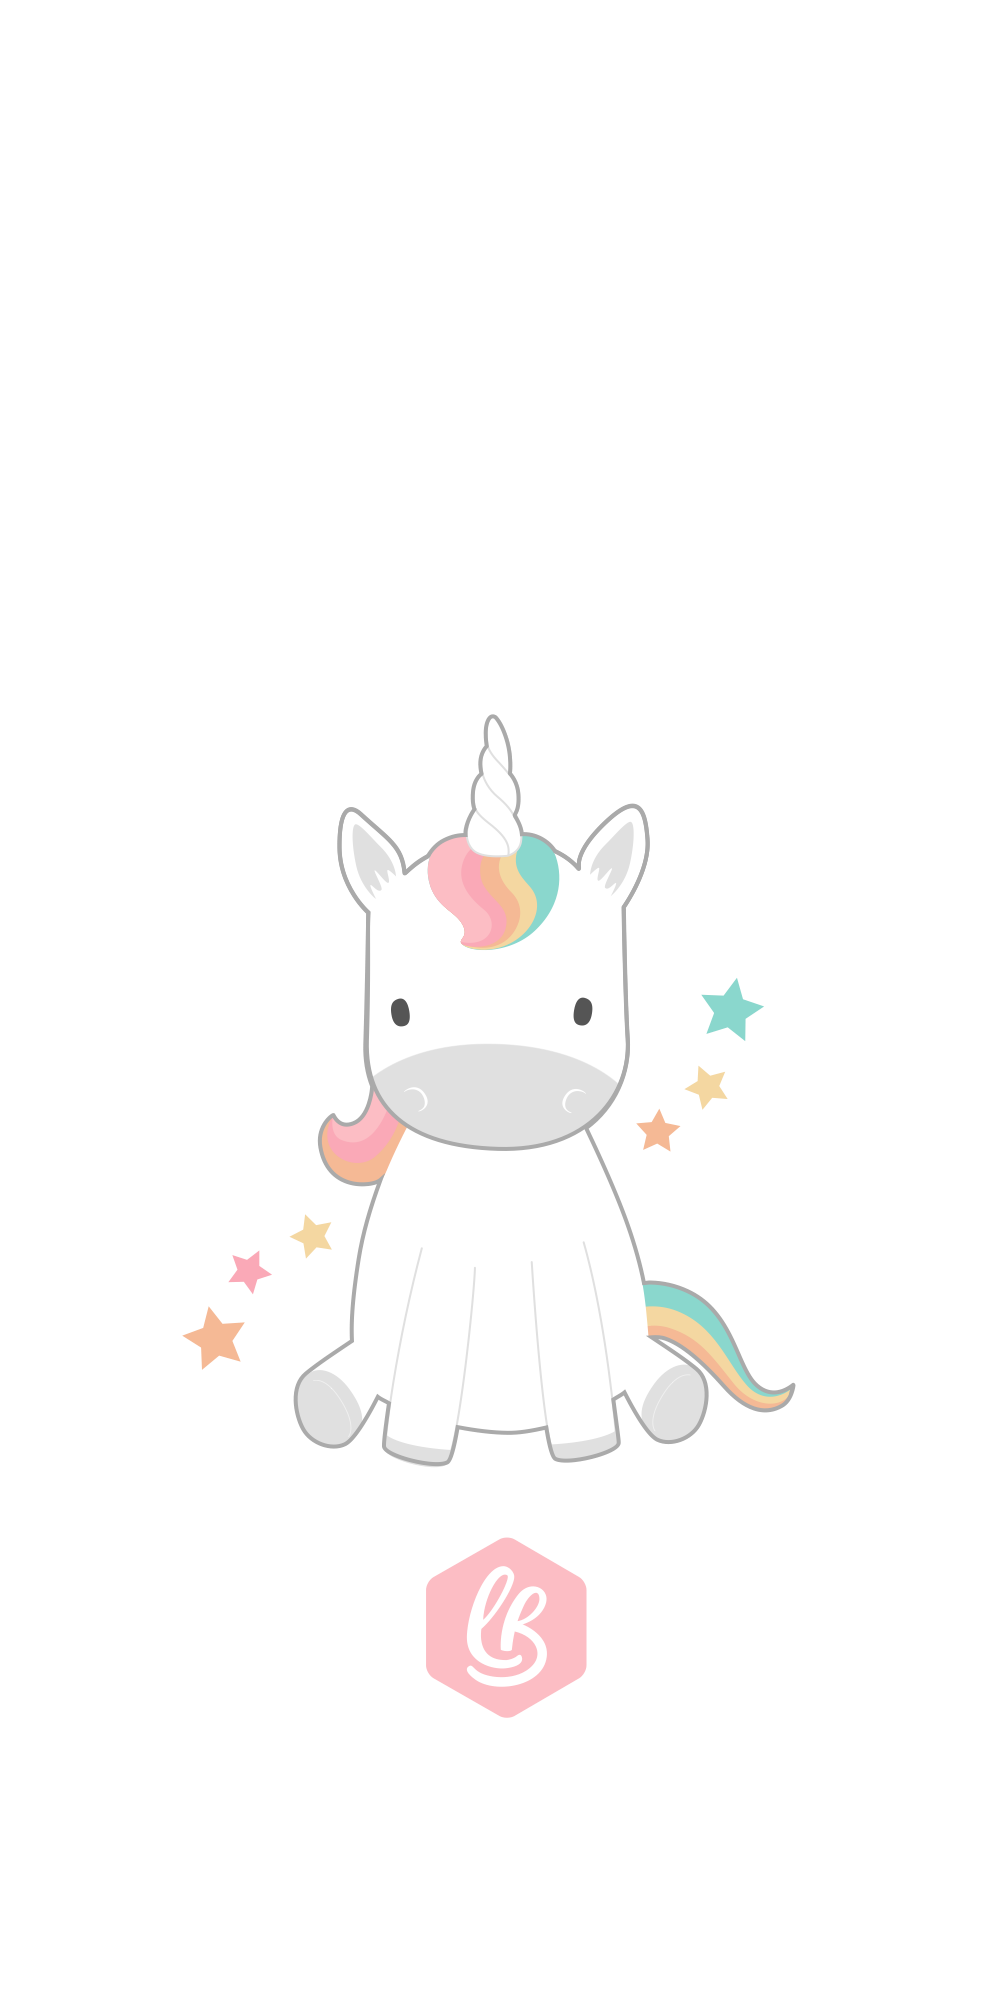 Cute Iphone Wallpaper Unicorn